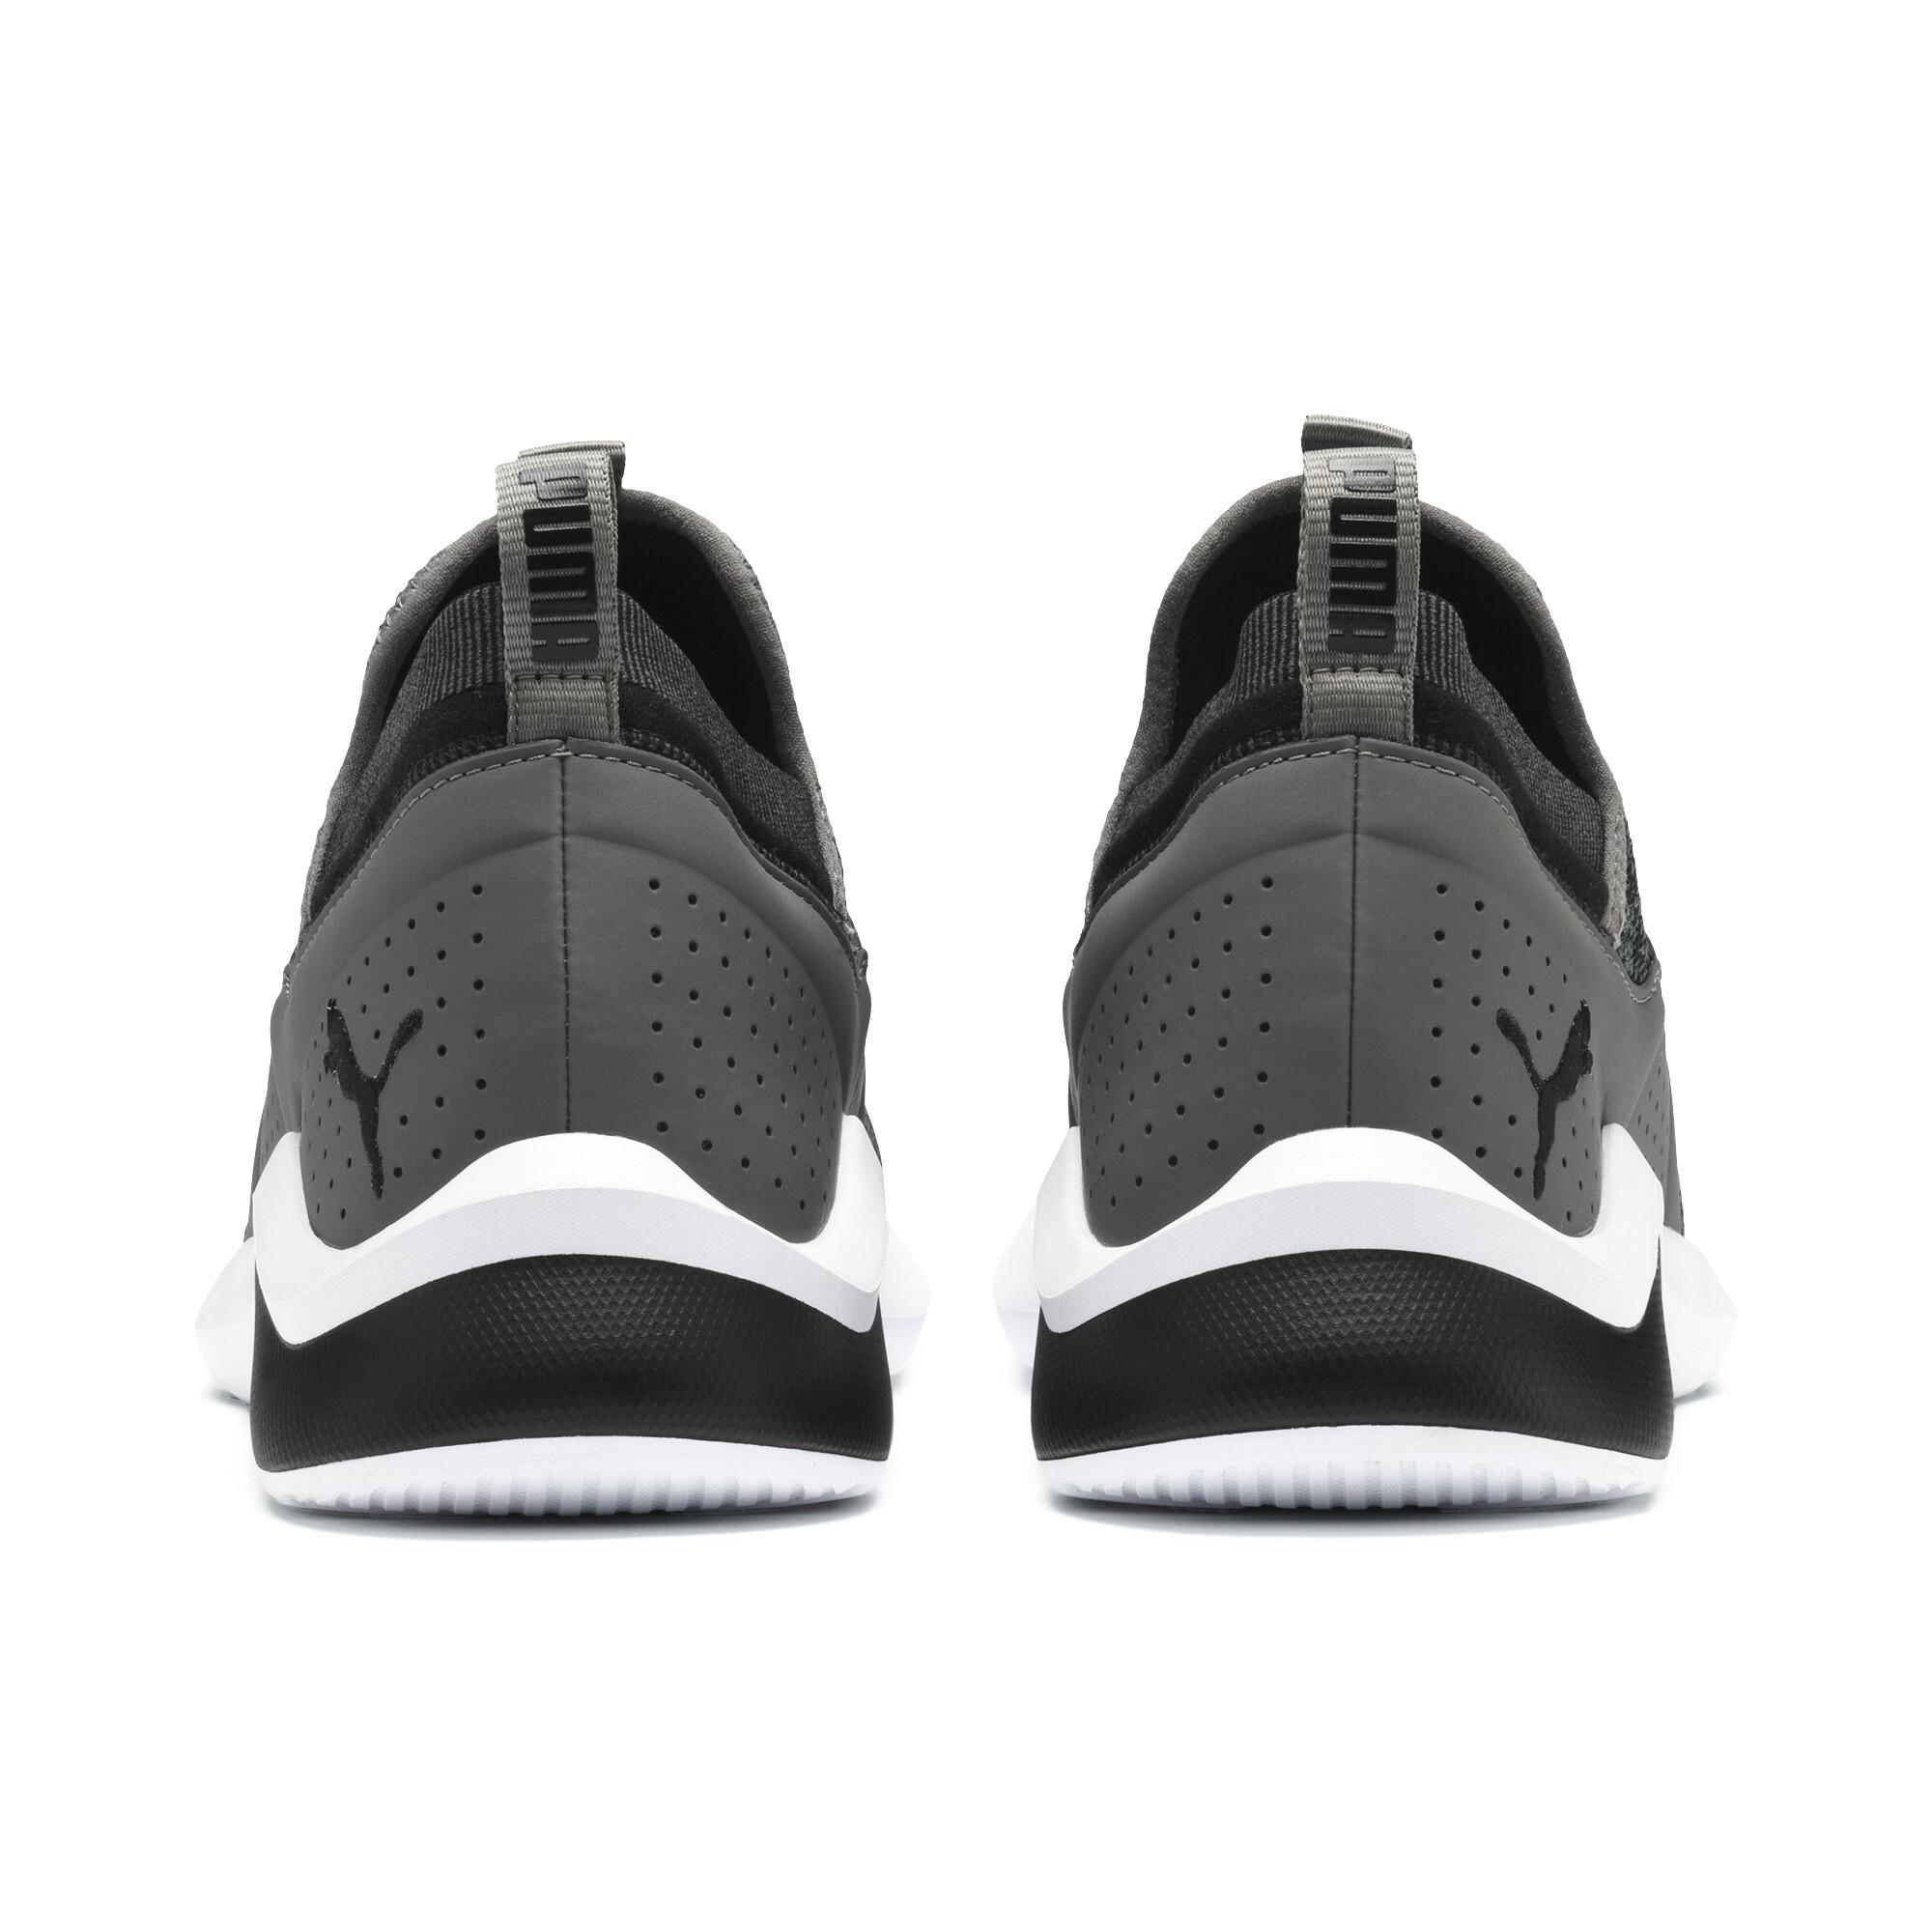 PUMA-Emergence-Men-039-s-Sneakers-Men-Shoe-Running thumbnail 15